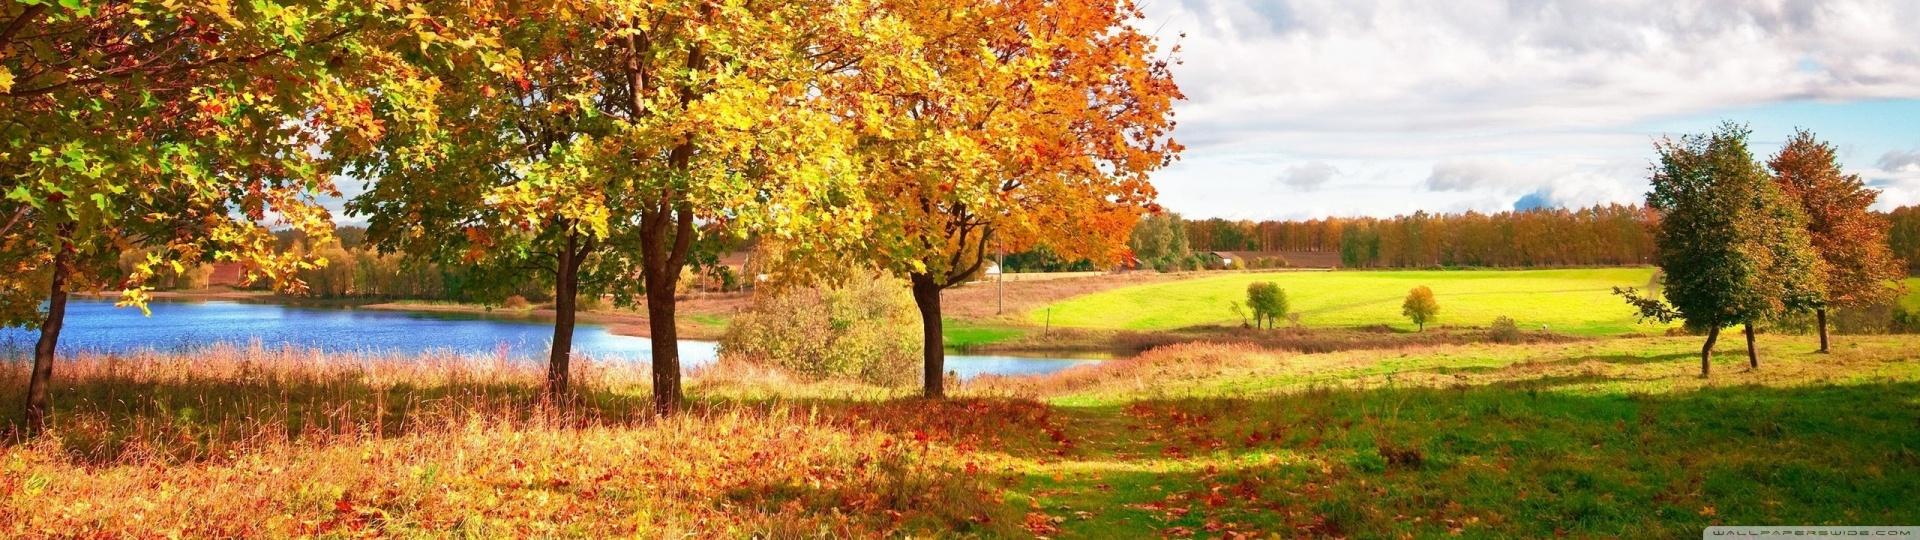 Fall Wallpaper For Large Monitors Beautiful Autumn Day 4k Hd Desktop Wallpaper For Dual